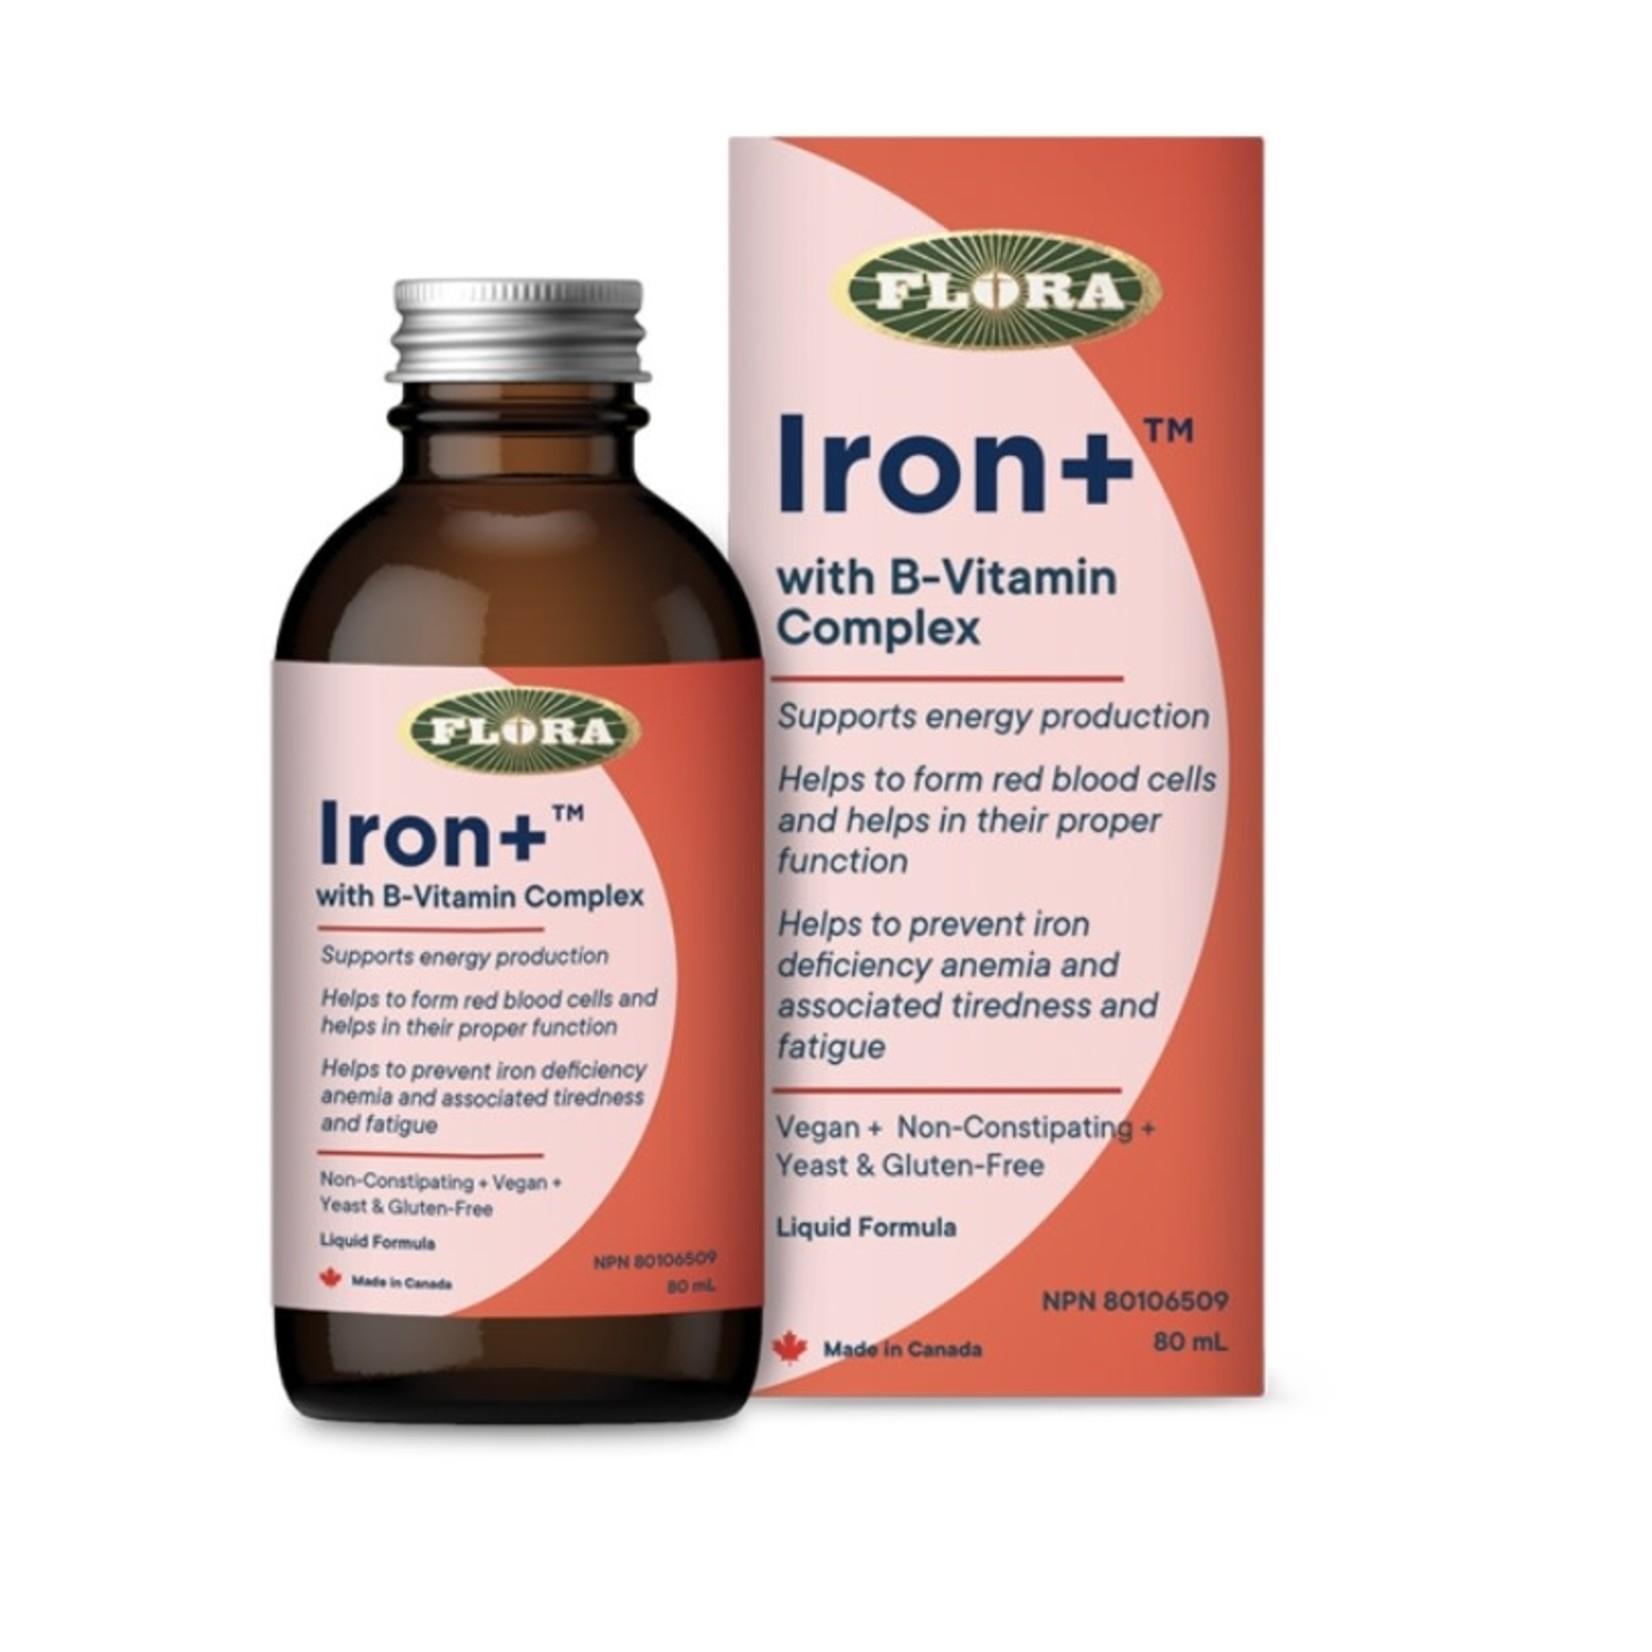 Flora Flora Iron+ 240ml